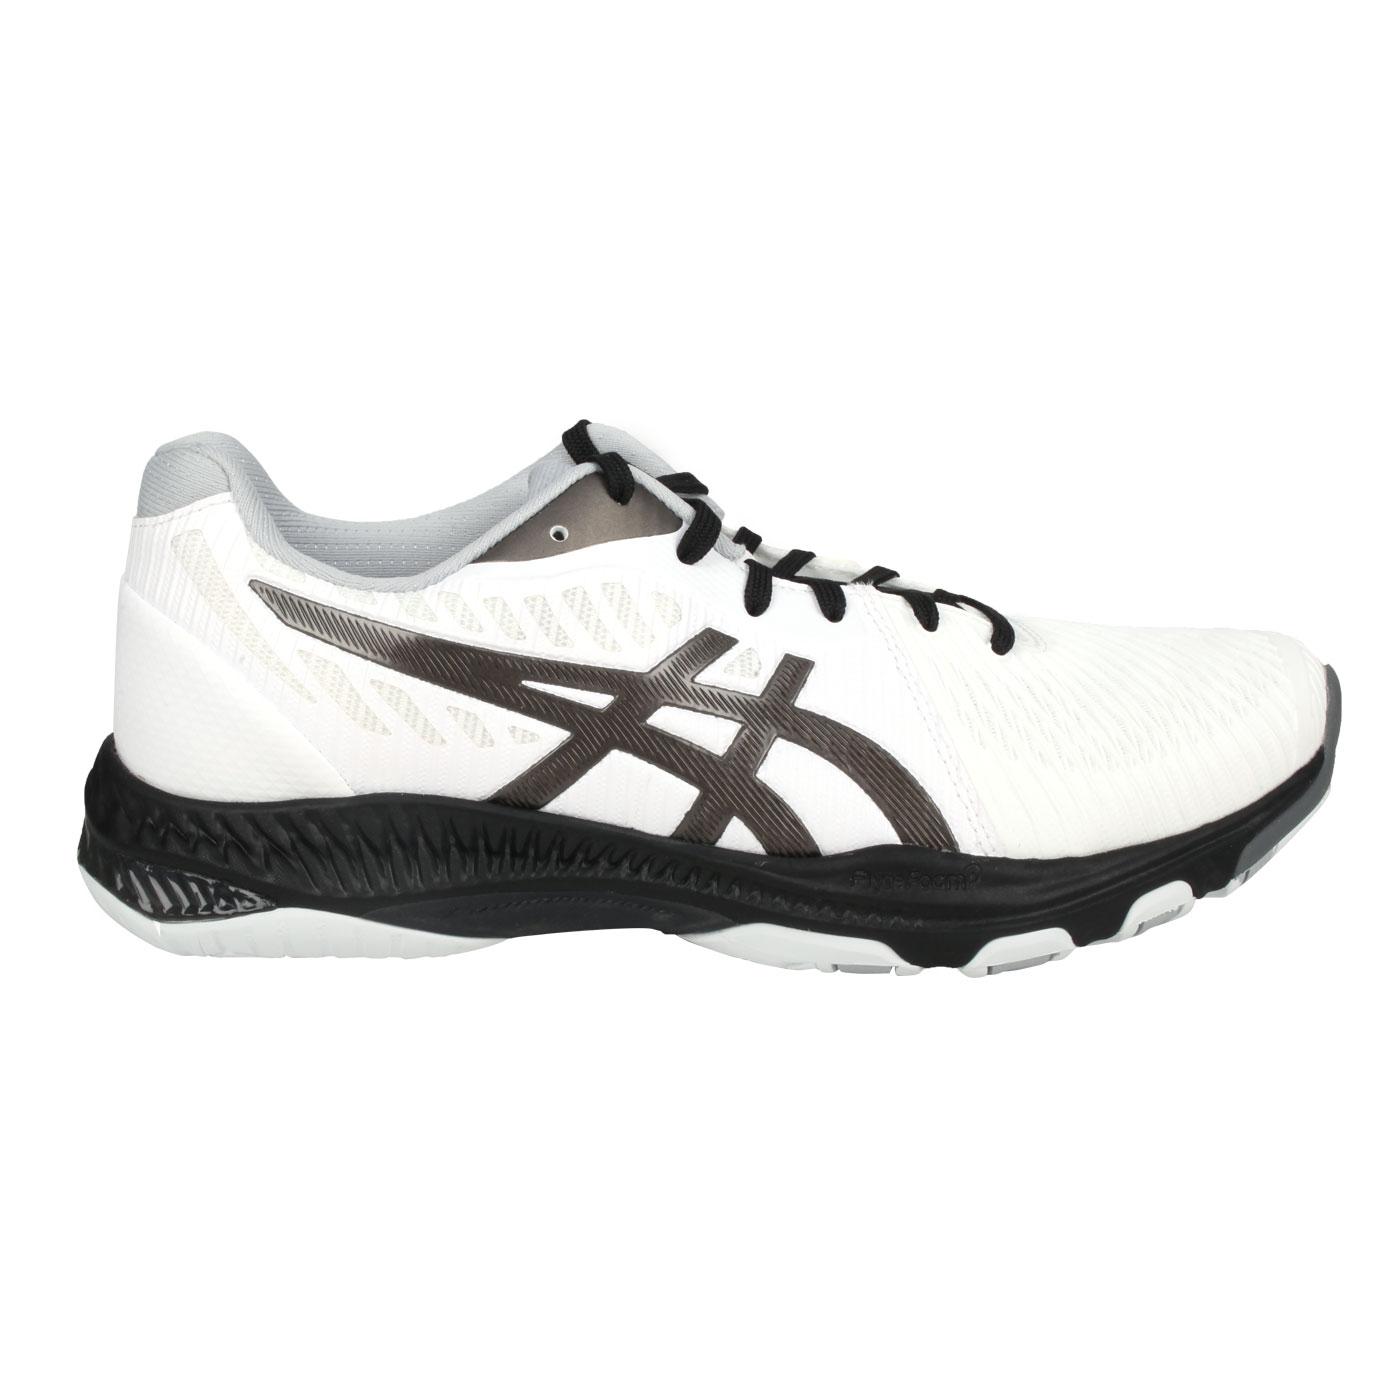 ASICS 男款排羽球鞋  @NETBURNER BALLISTIC FF 2@1051A041-001 - 白黑灰